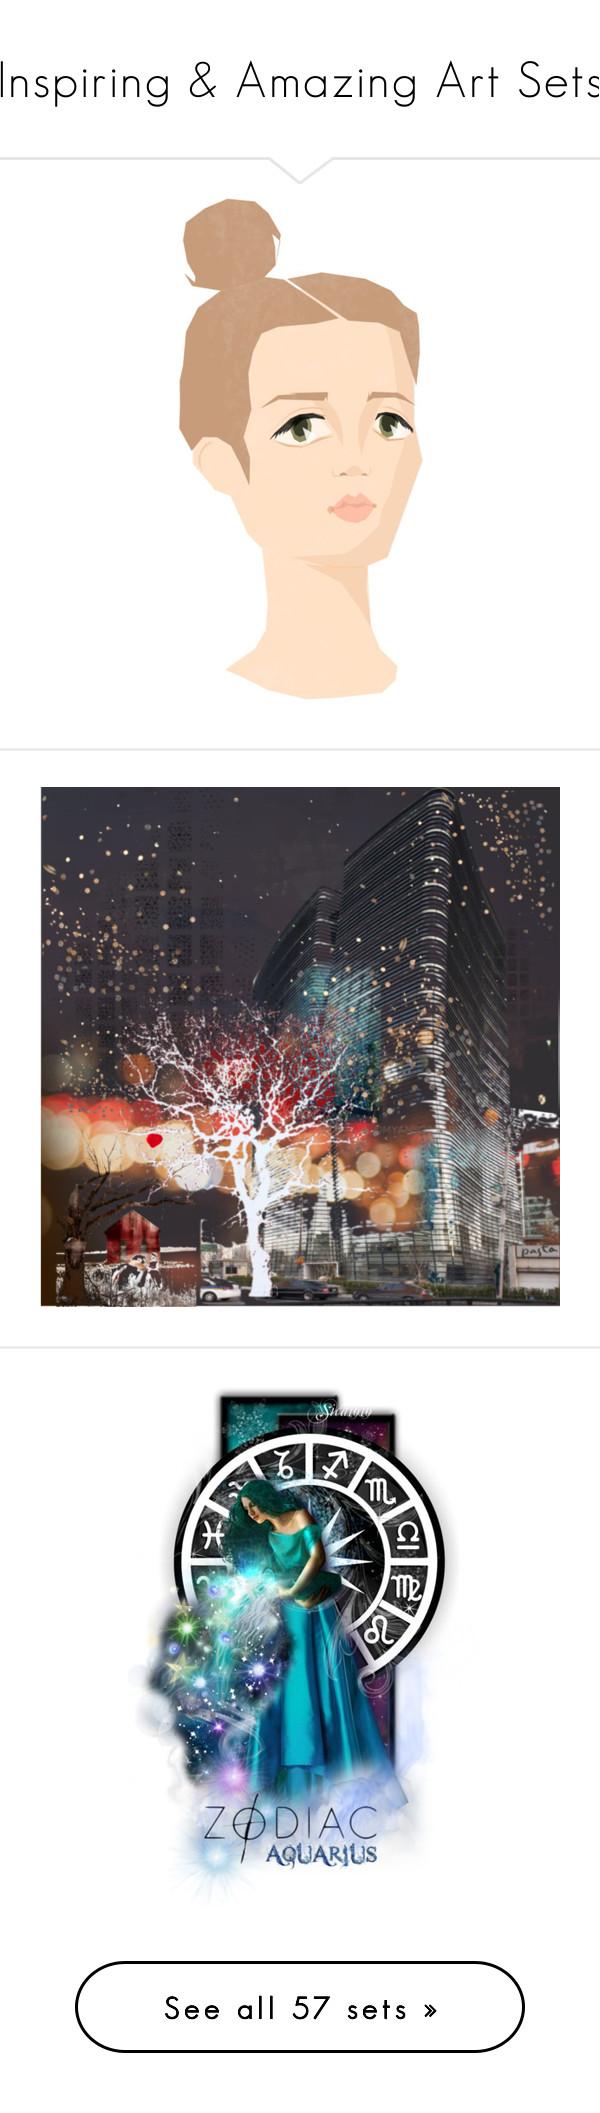 """Inspiring & Amazing Art Sets"" by jennross76 ❤ liked on Polyvore featuring art, zodiac, Aquarius, astrology, musicmakestheset, Chanel, 174, elainestopsets, nksecretsanta and lymediseaseawareness"